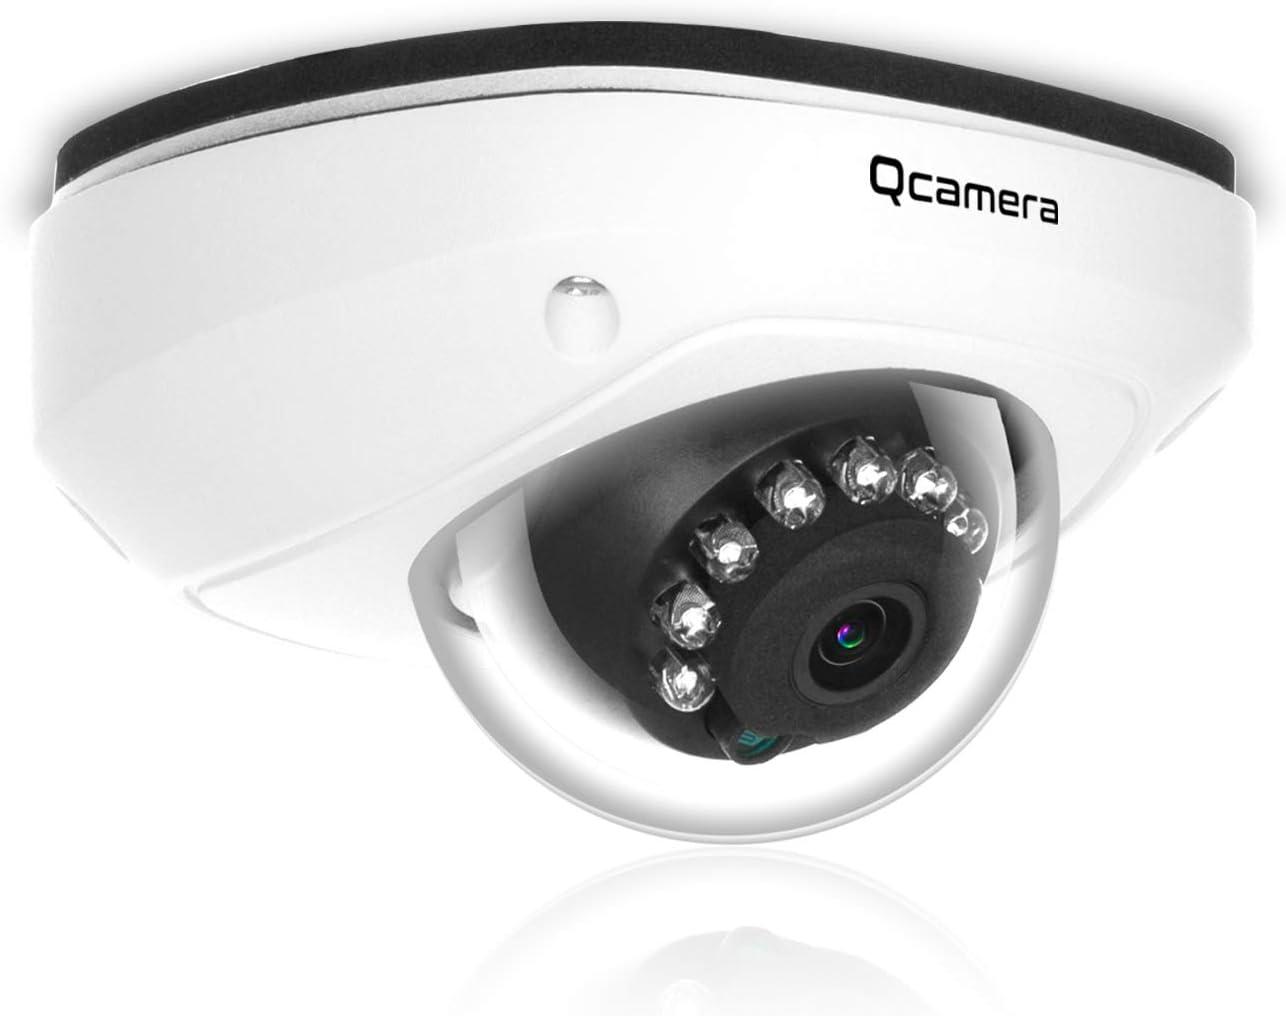 Q-camera Dome Security Camera 1080P HD 4 AHD 1 Award Free shipping / New in A CVI TVI CVBS